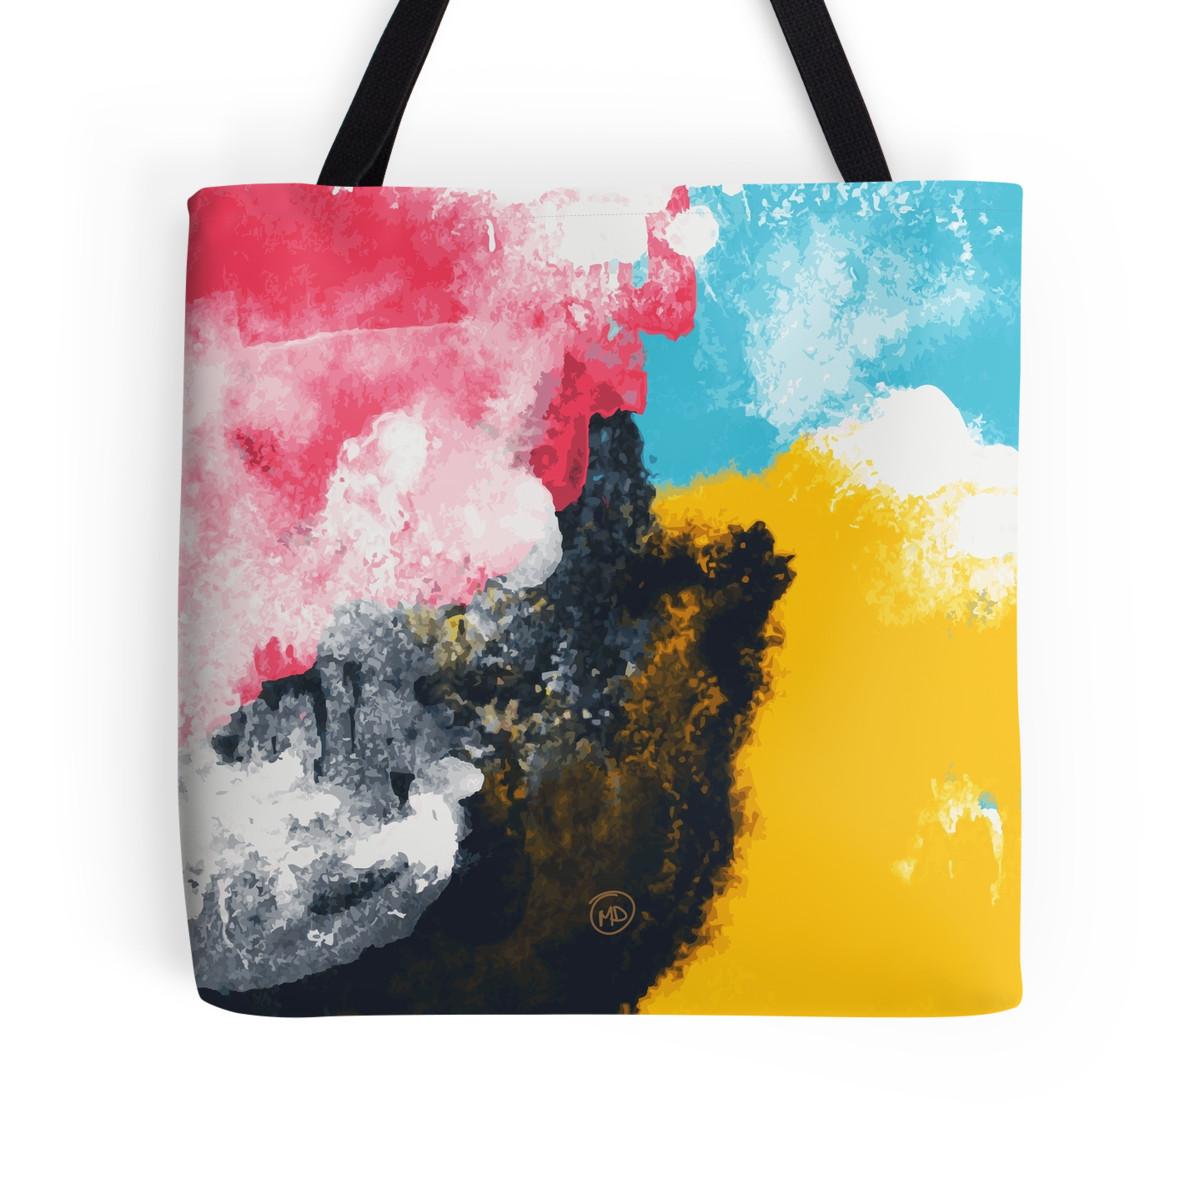 watercolour bag